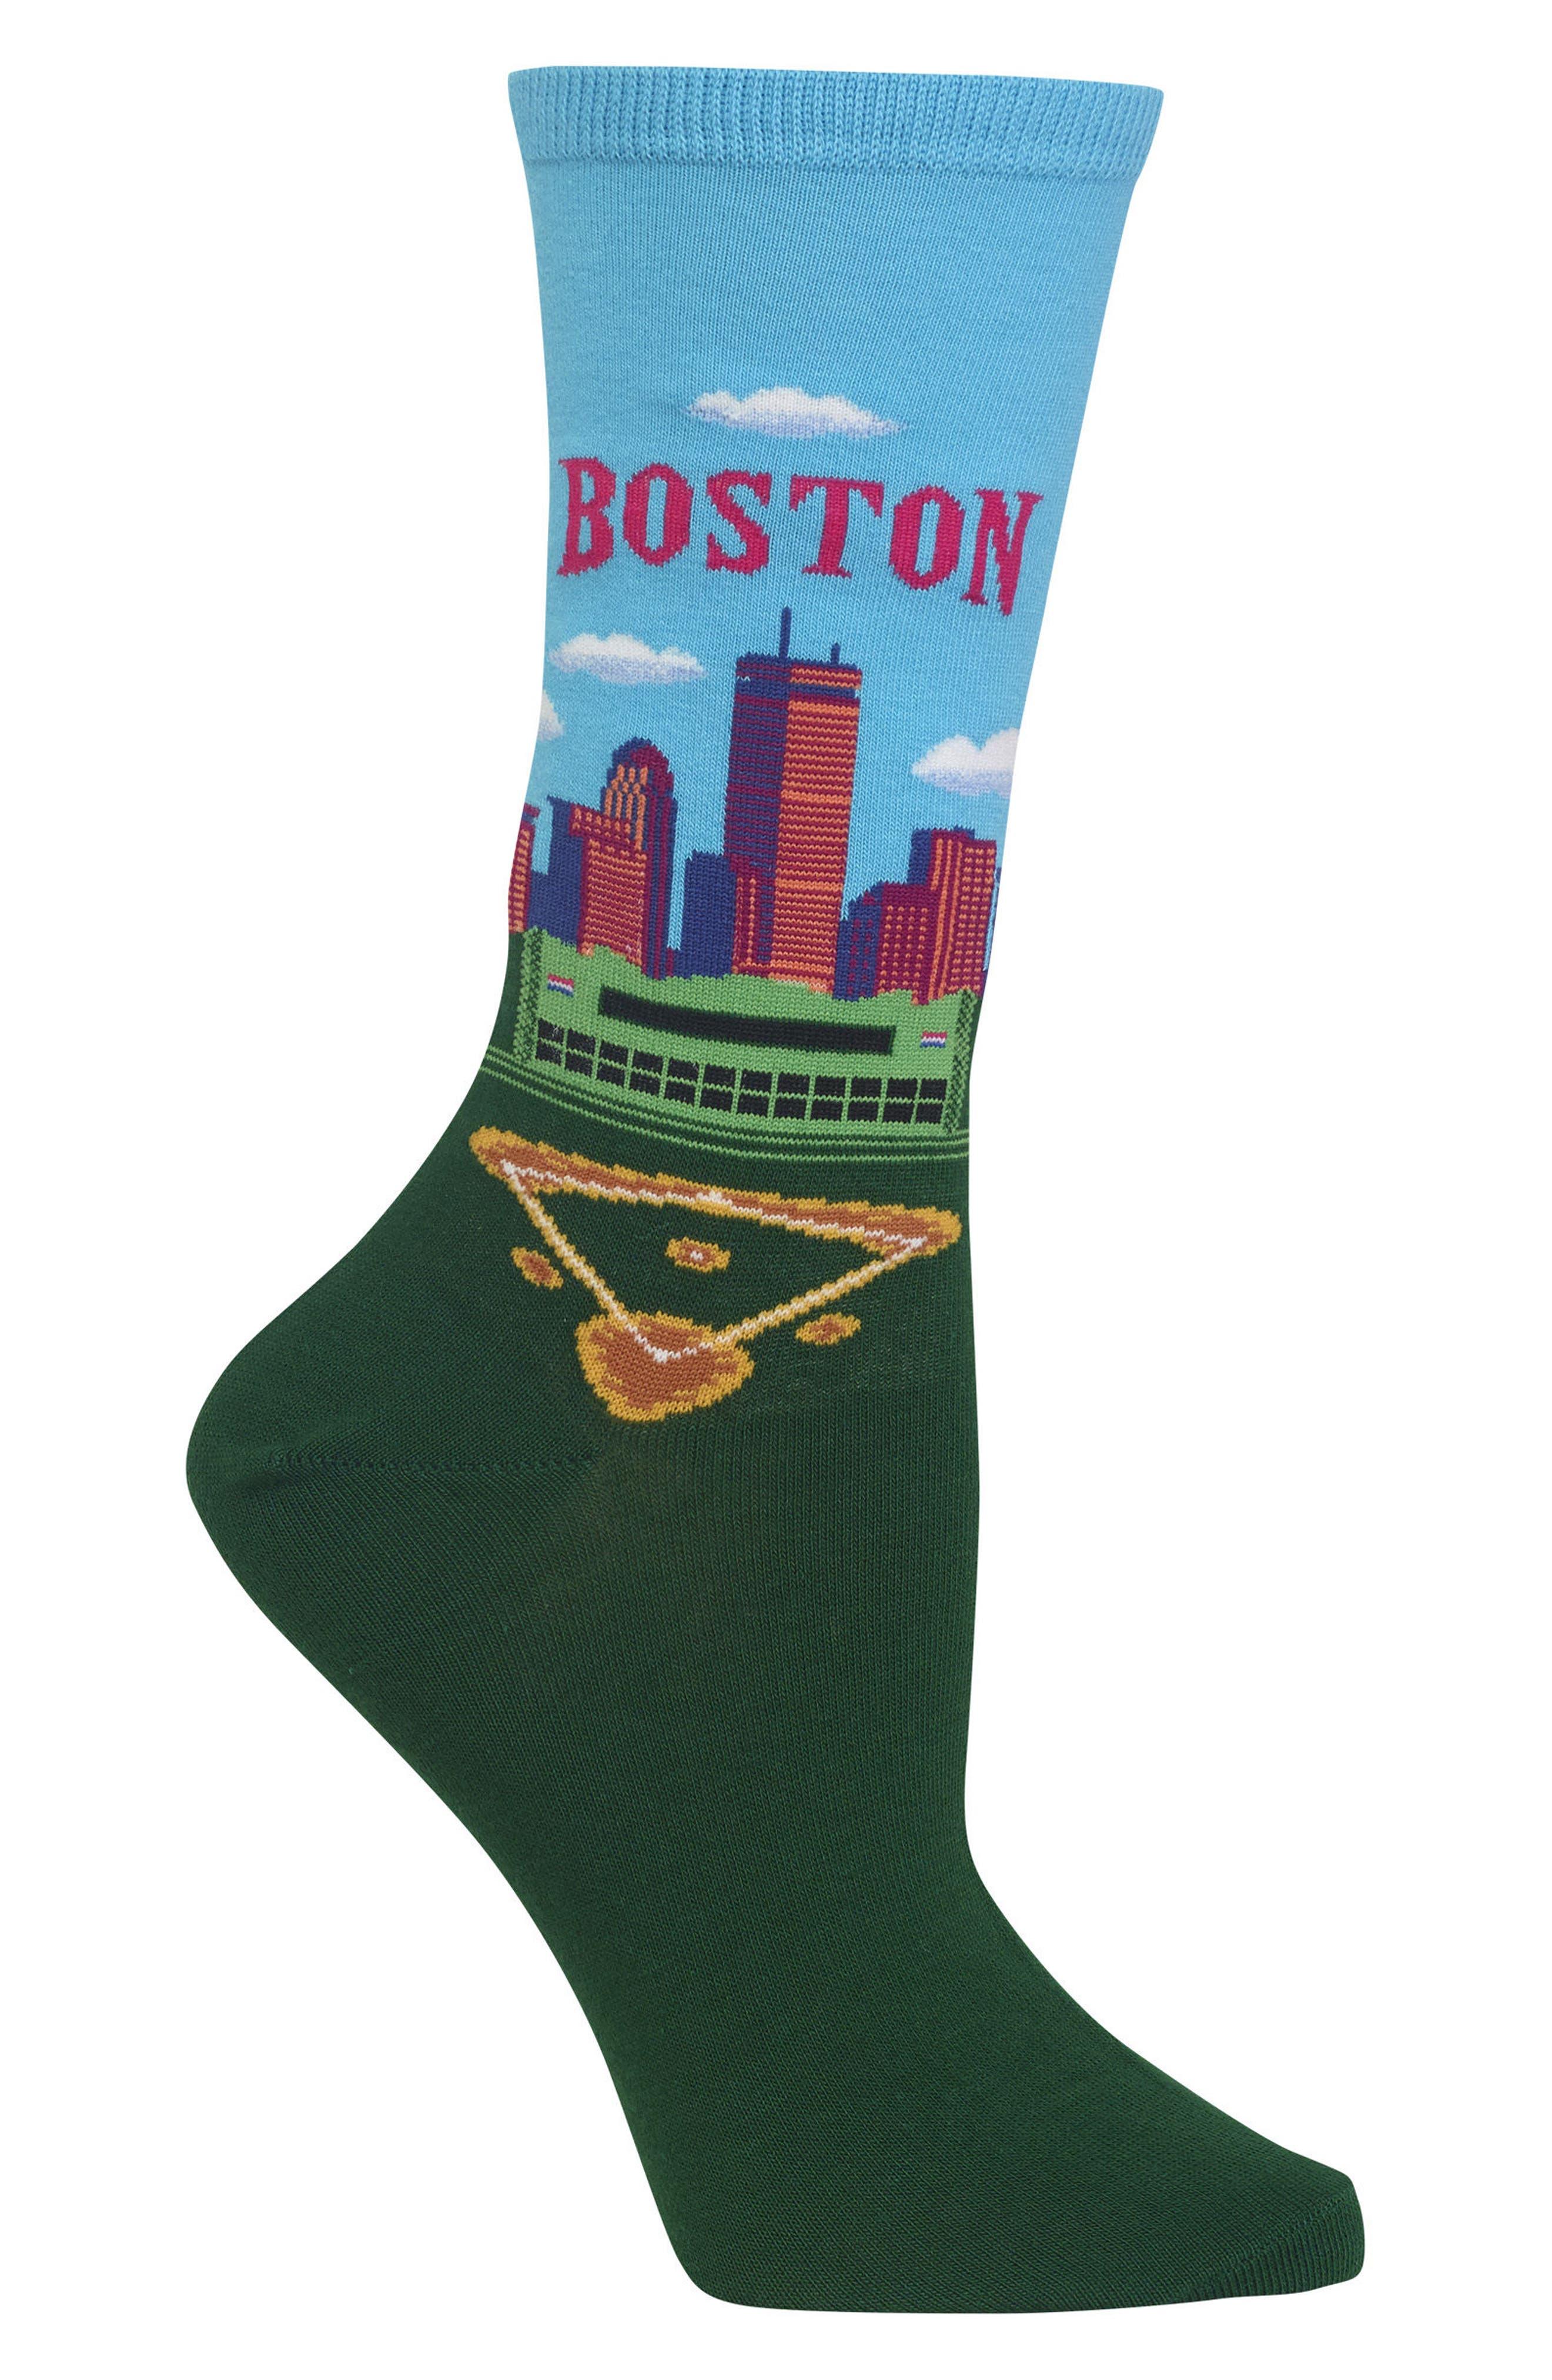 Travel Series - Boston Crew Socks,                             Alternate thumbnail 3, color,                             Light Blue